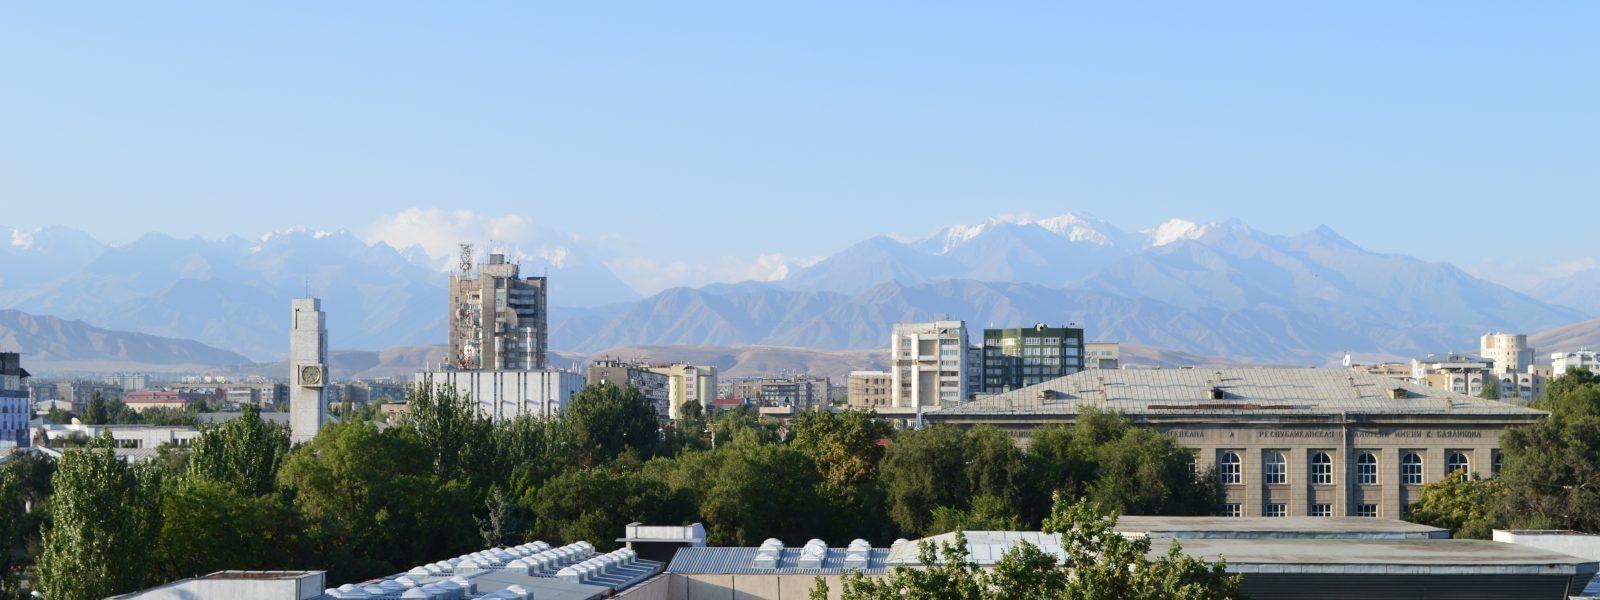 Bishkek Kyrgyzstan things to do